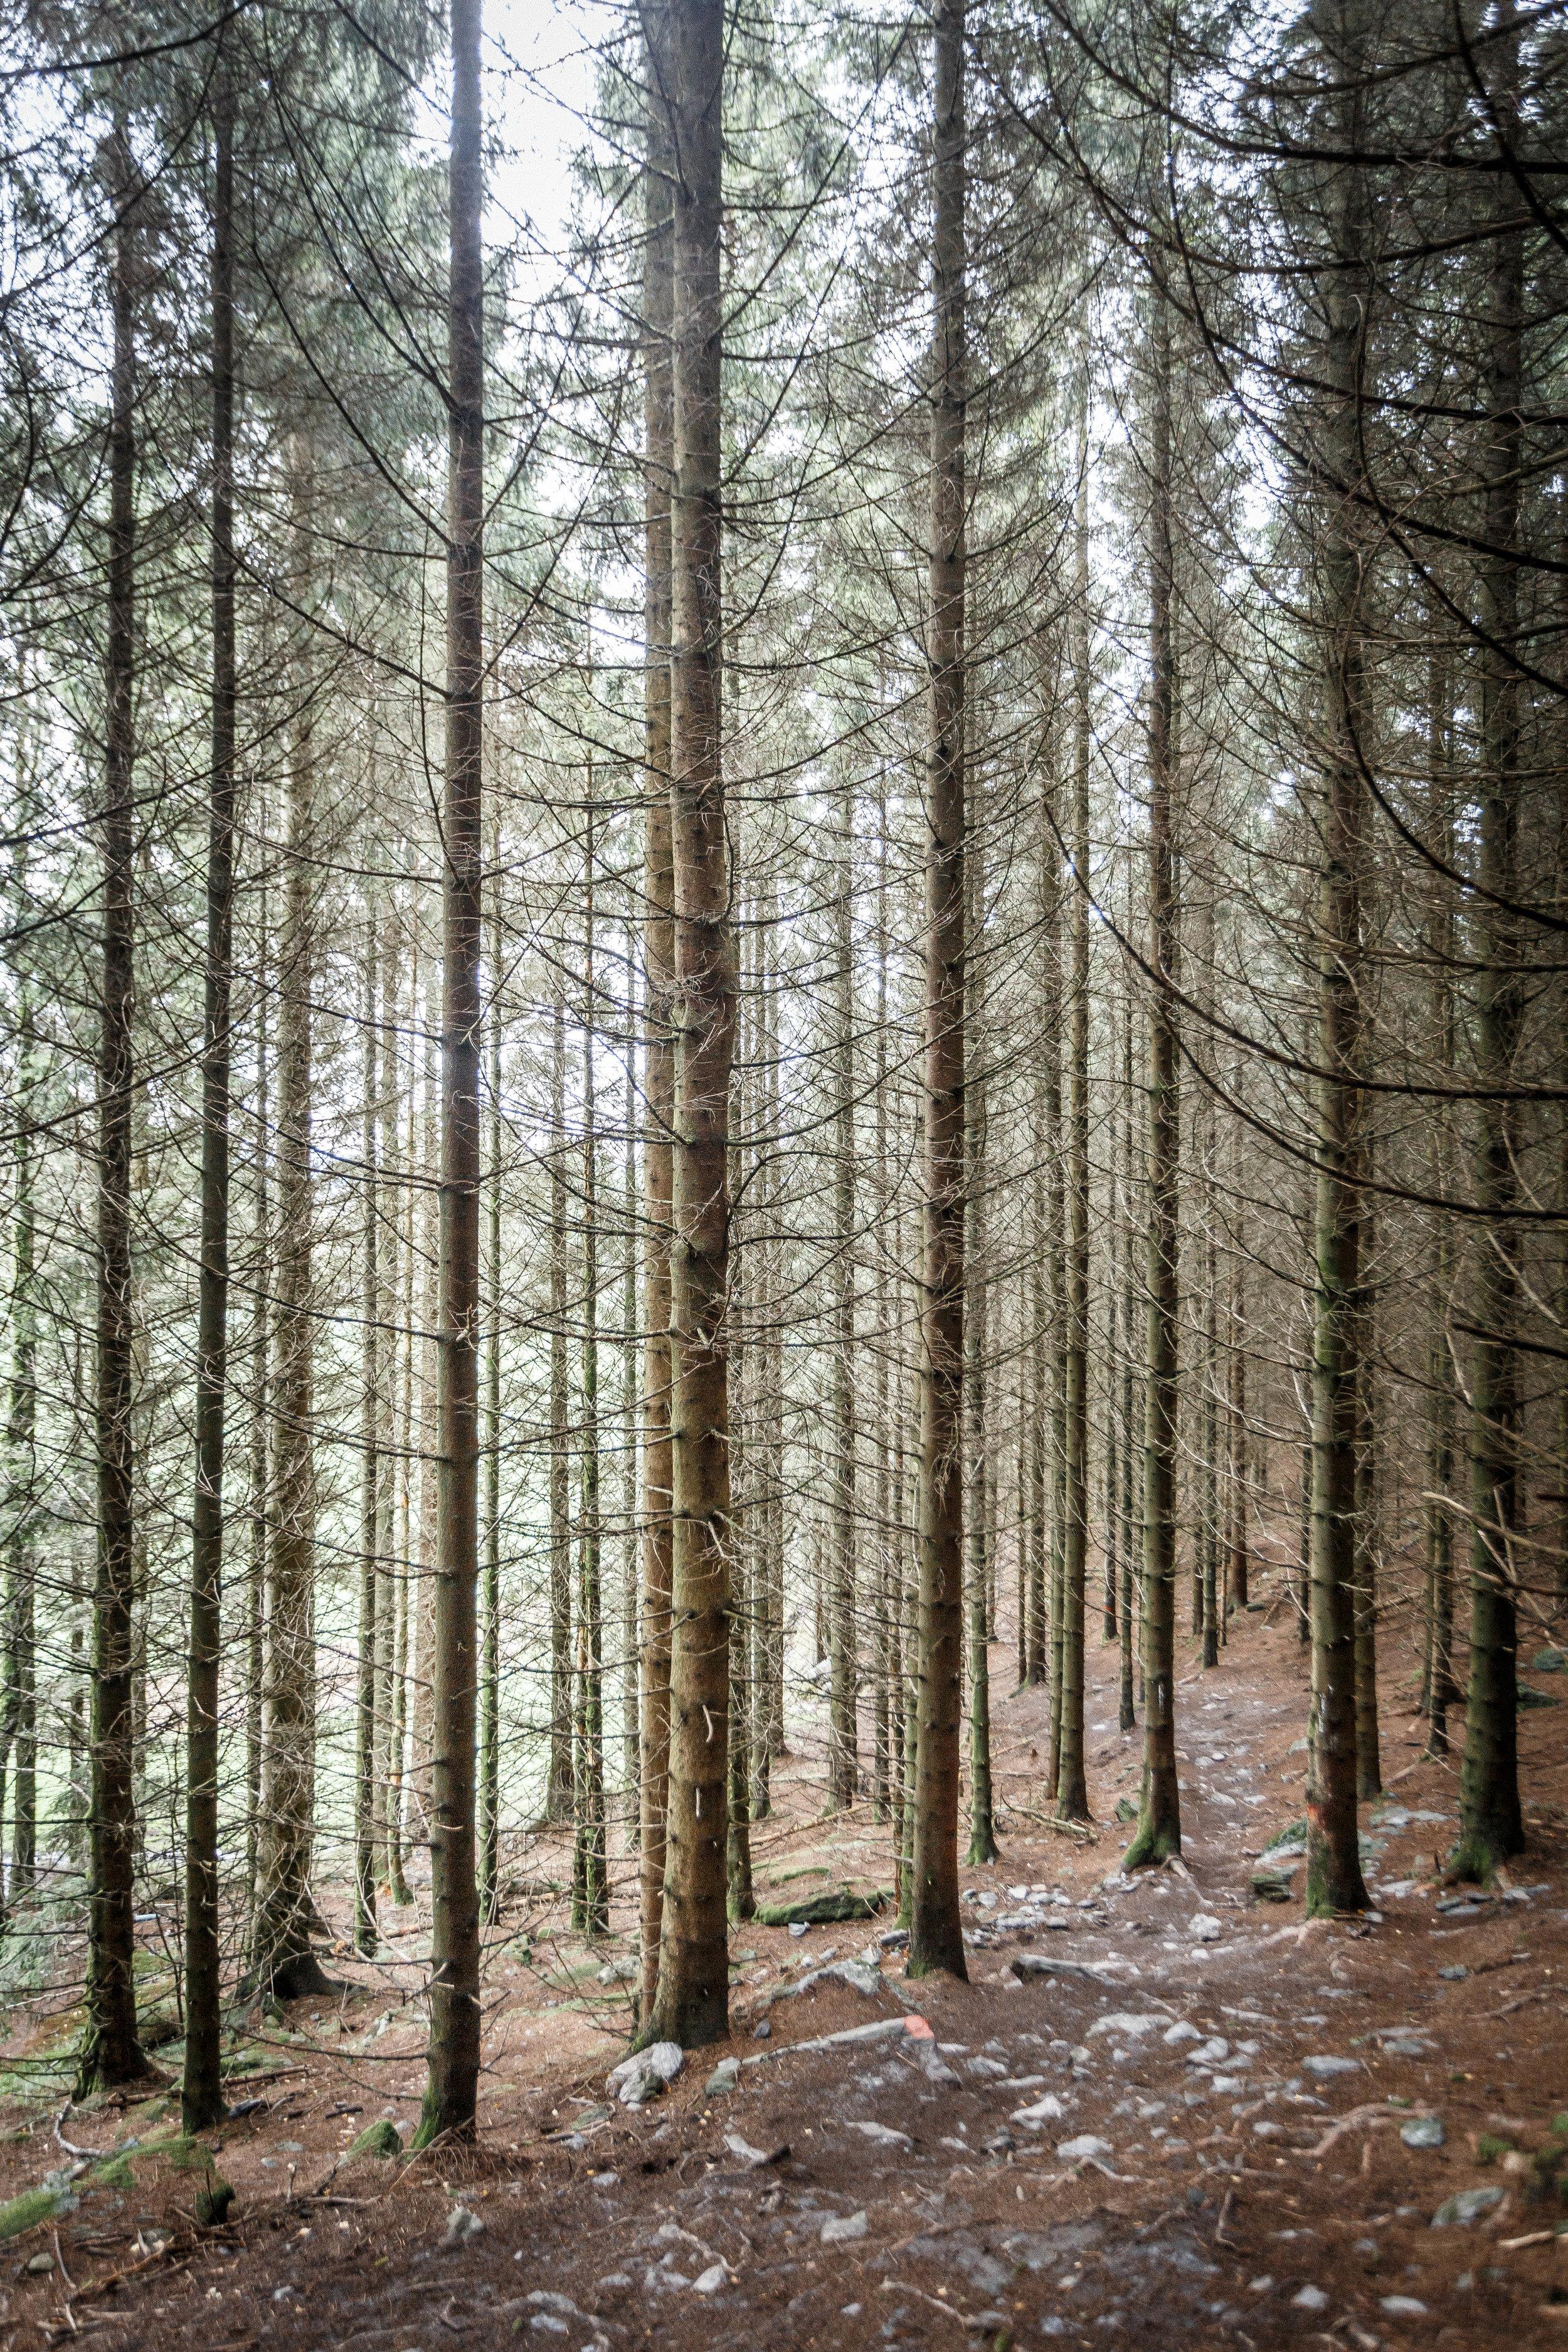 North_forest_19.jpg